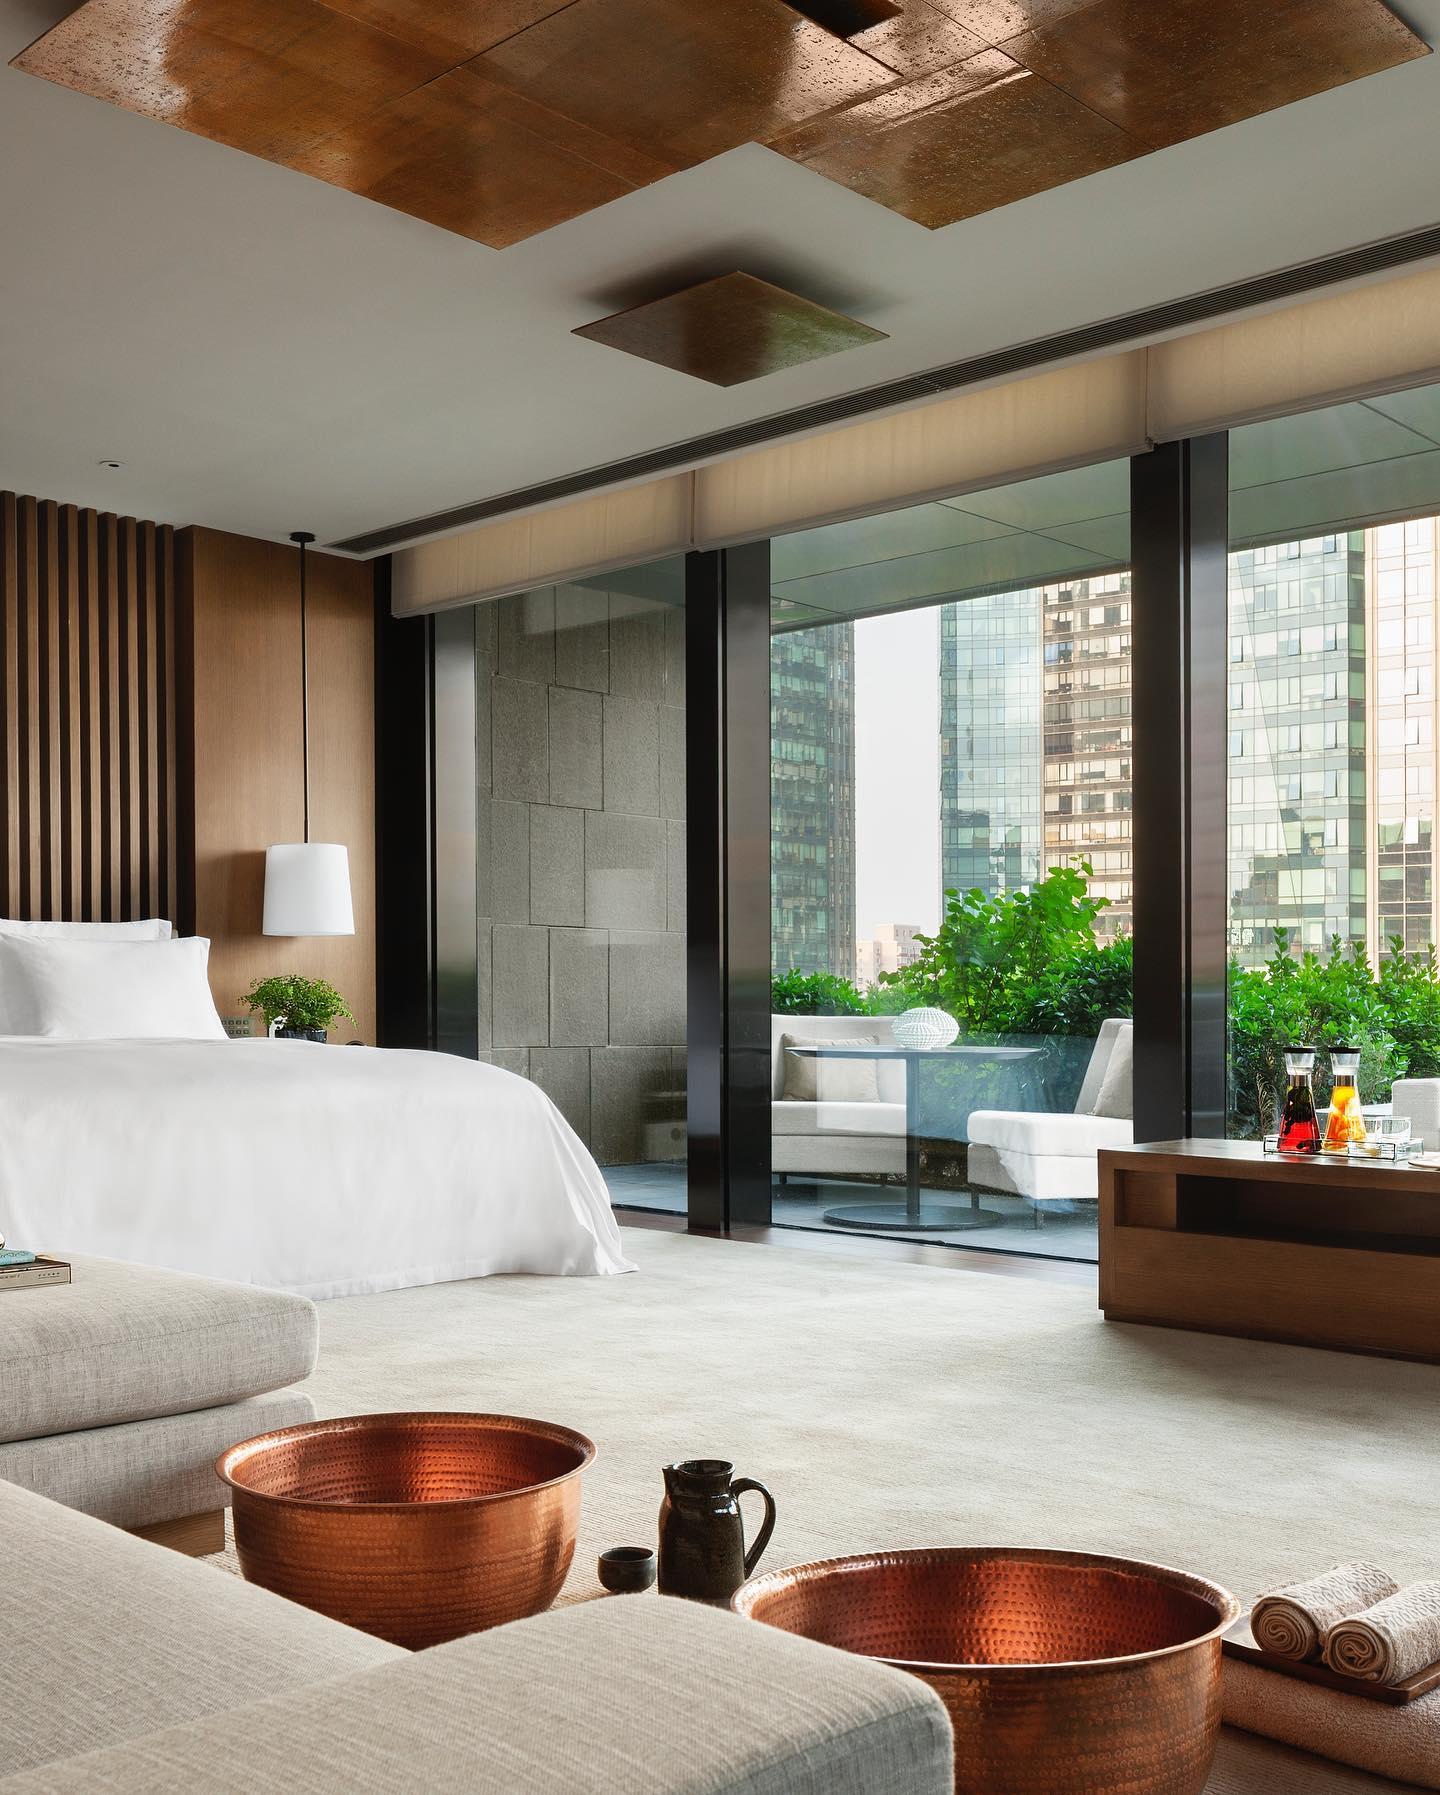 Rosewood Beijing, luna de miel en China, hoteles para luna de miel en China - Wedding Hub - 015